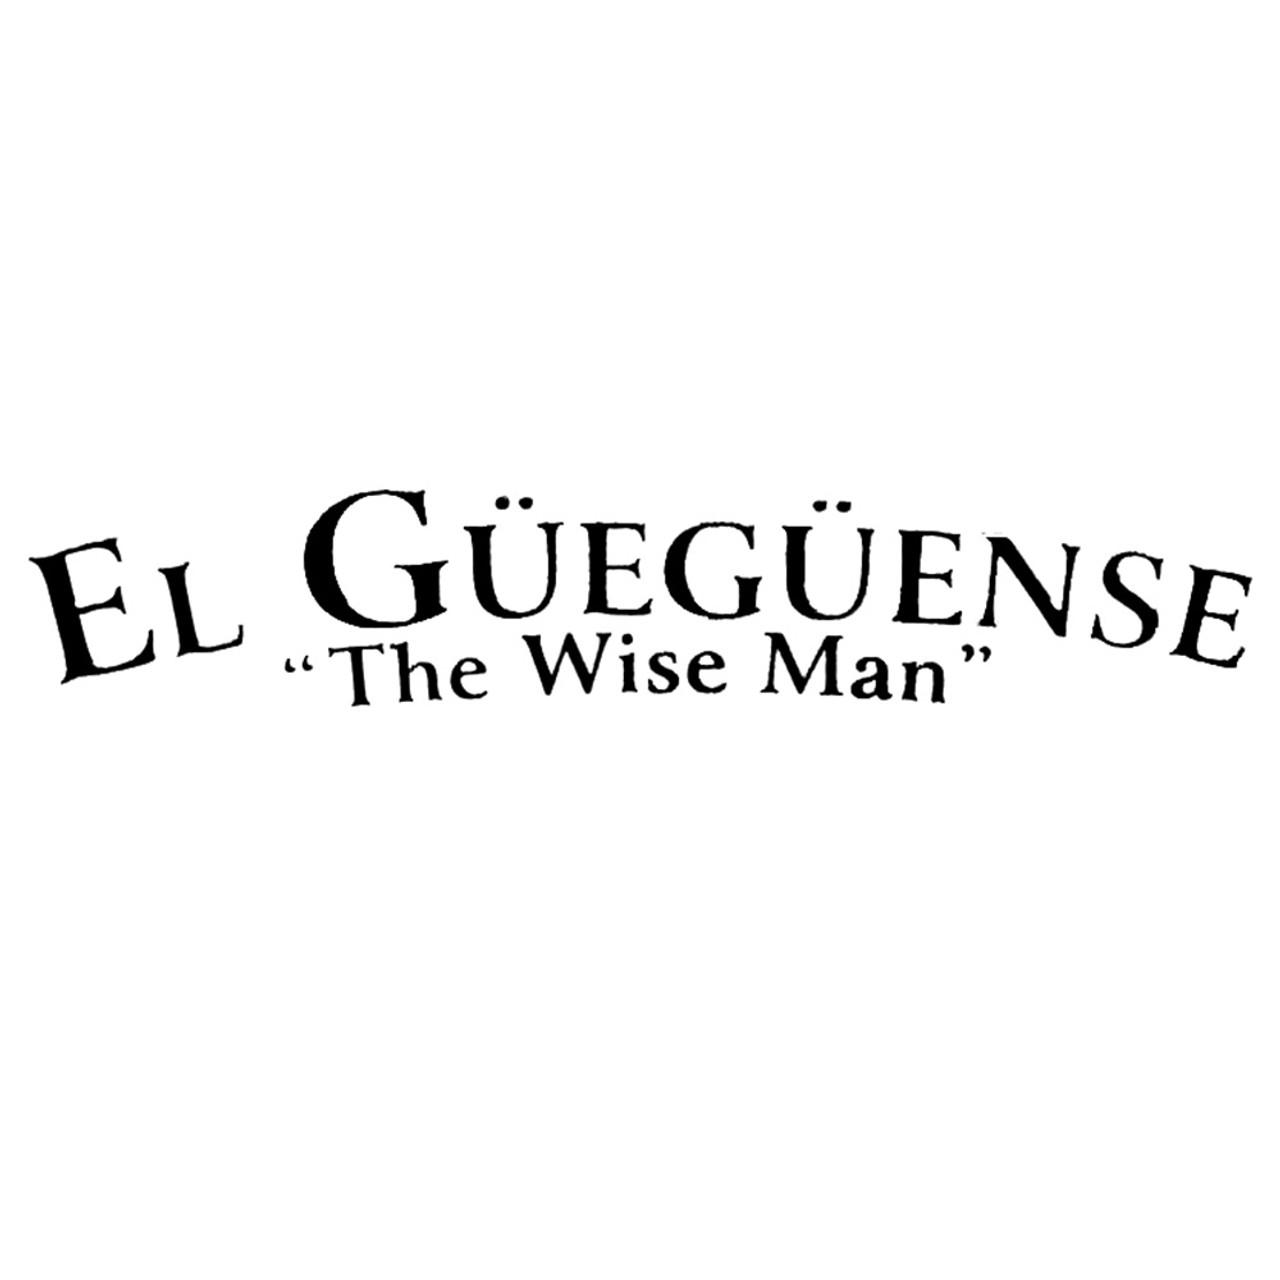 Foundation El Gueguense Lancero Cigars - 7 x 40 (Box of 13)